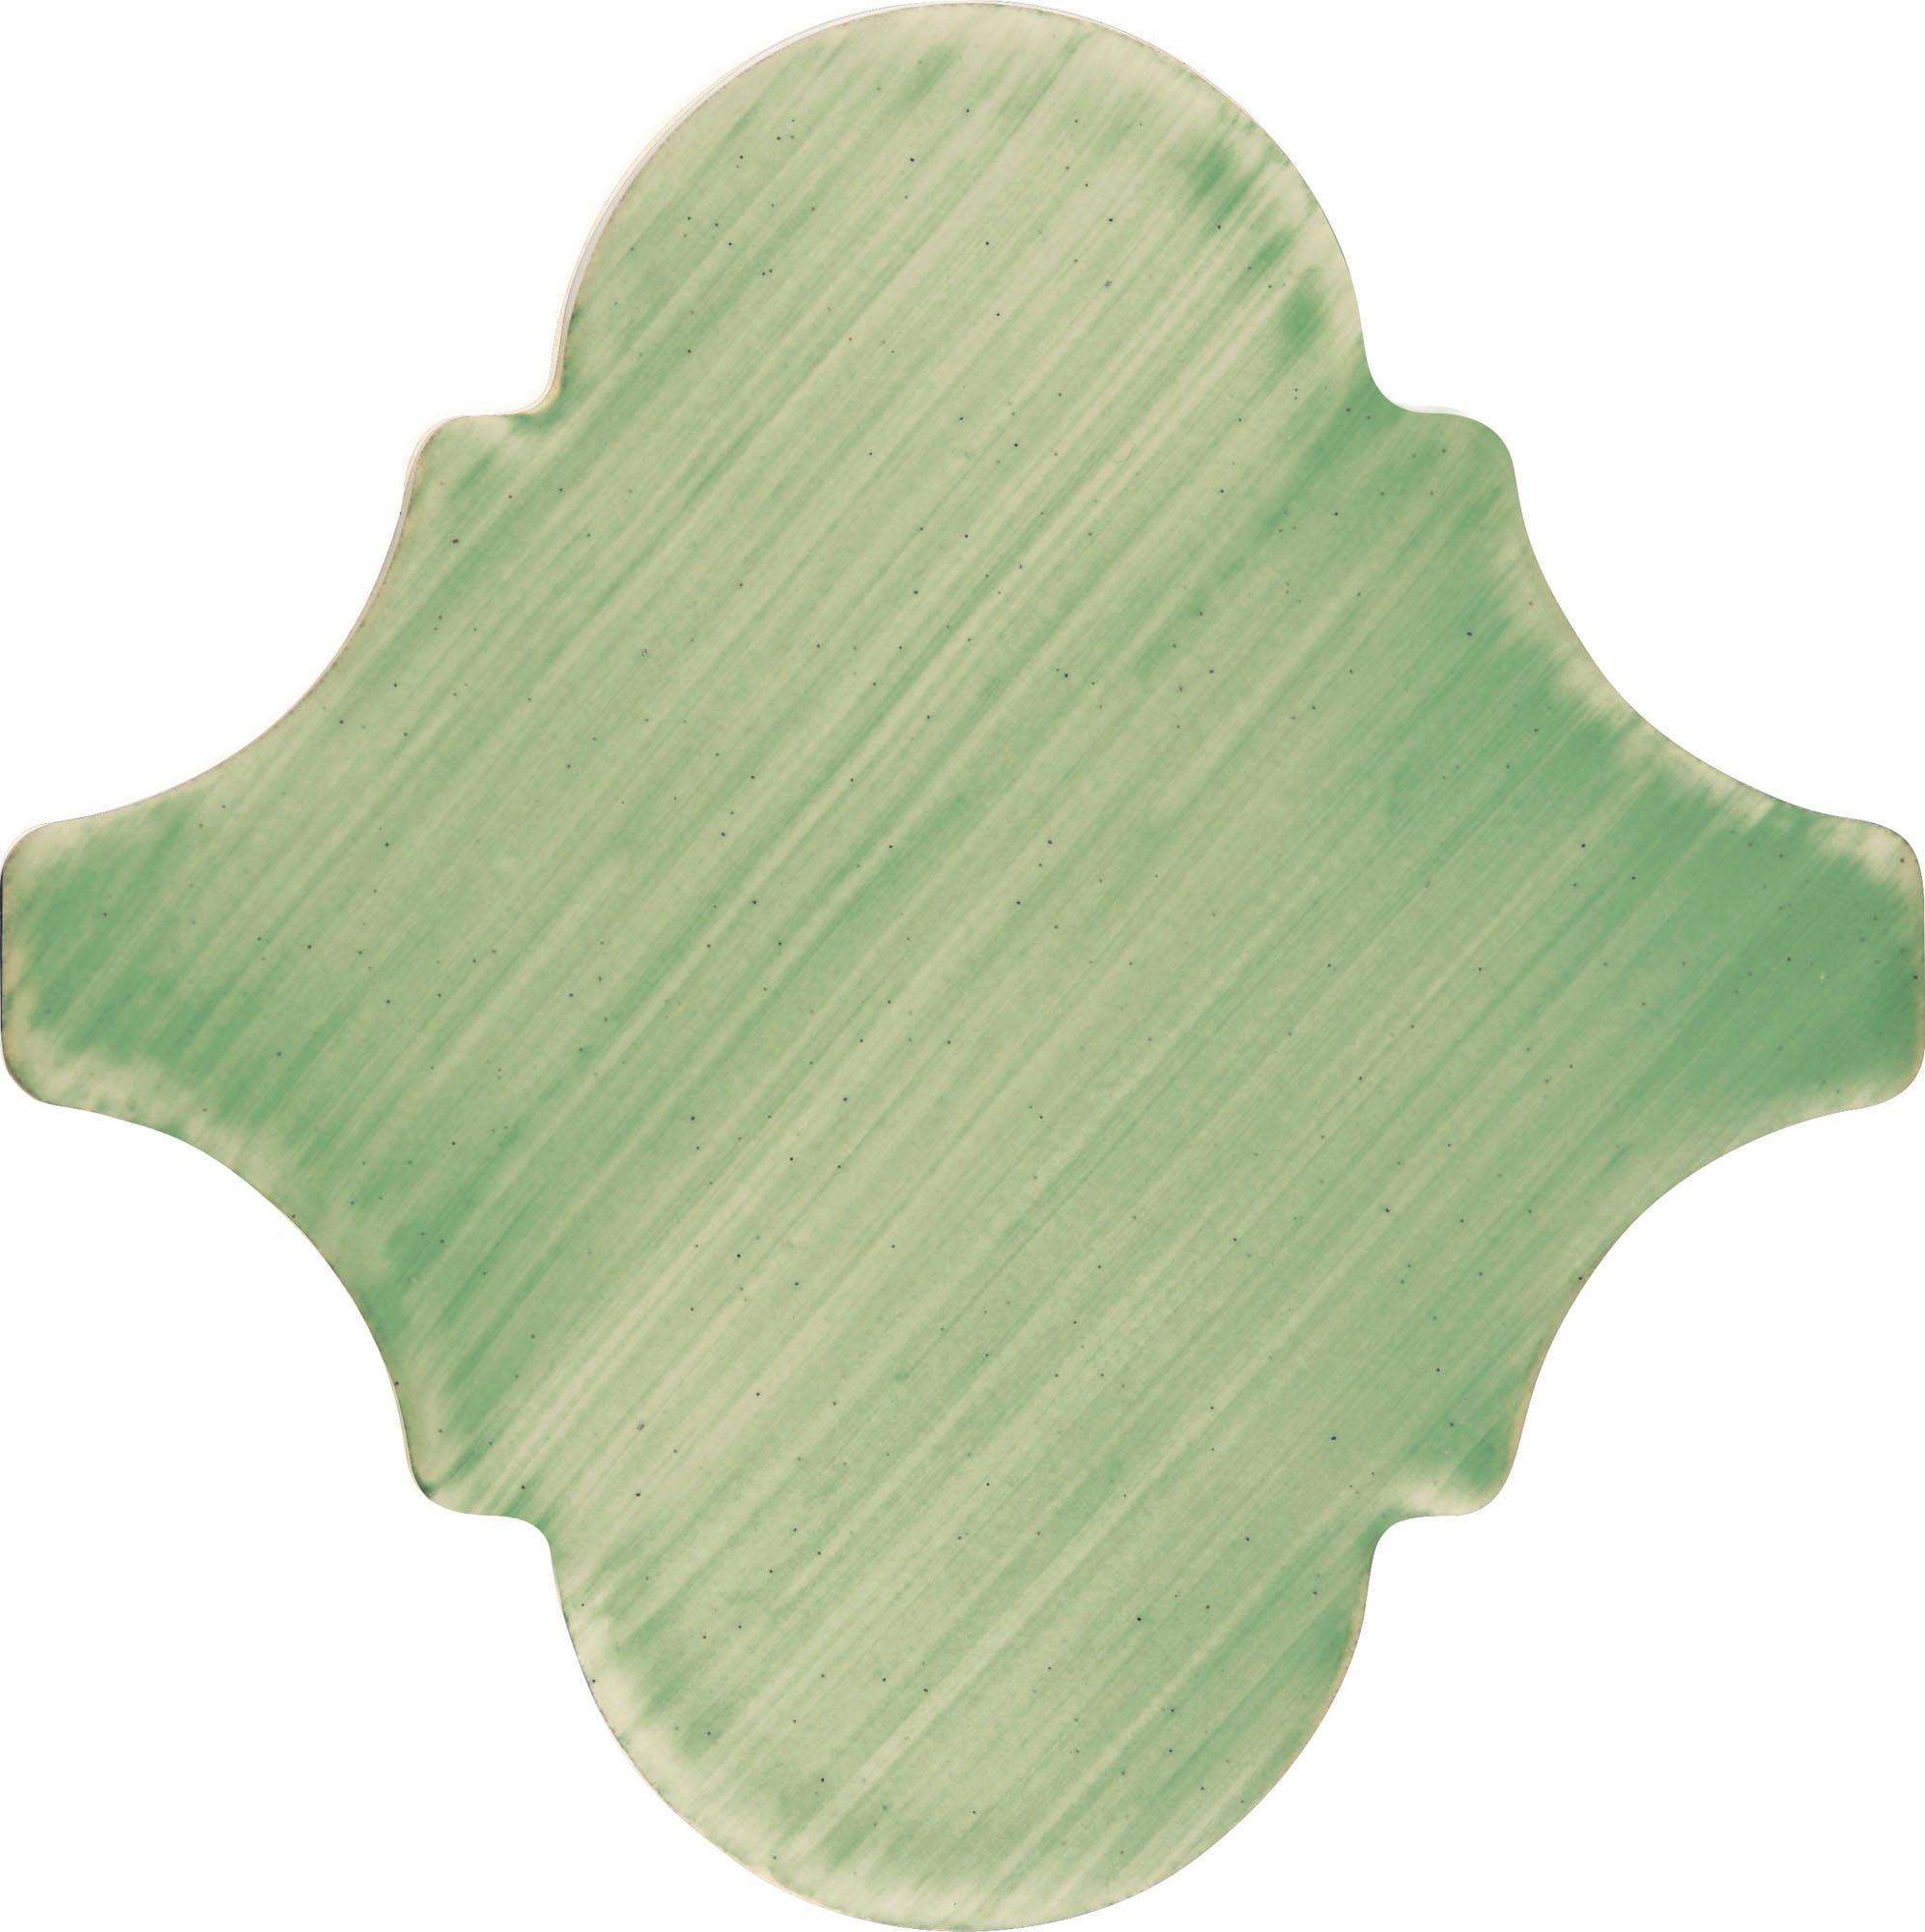 PF019 Color Art Plain Green Arabesque